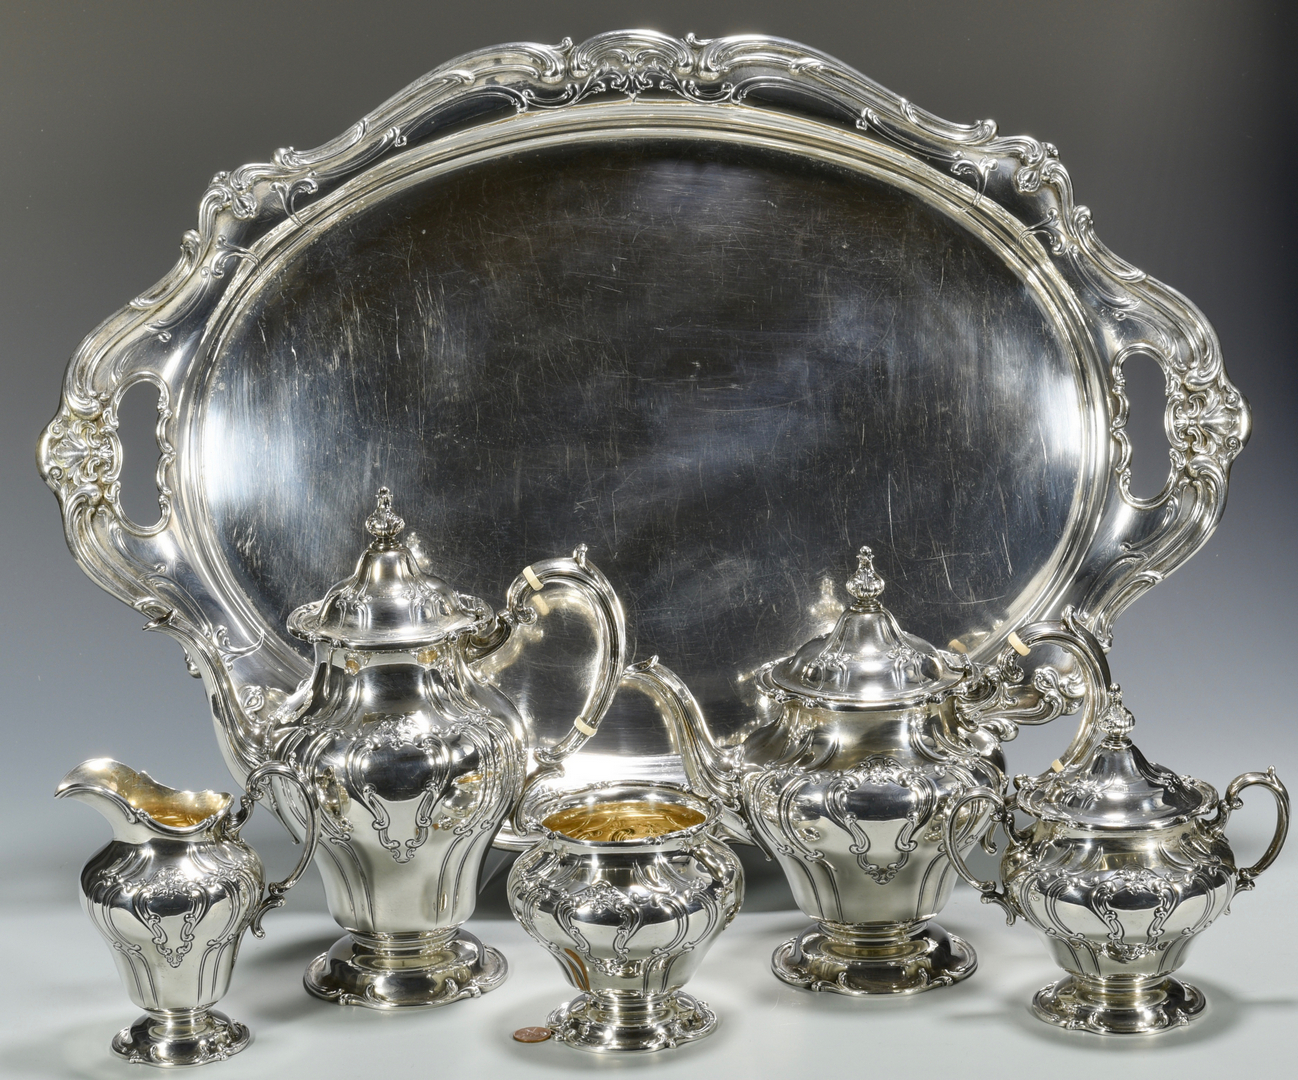 Lot 46 Gorham Chantilly Sterling Tray Amp Tea Set